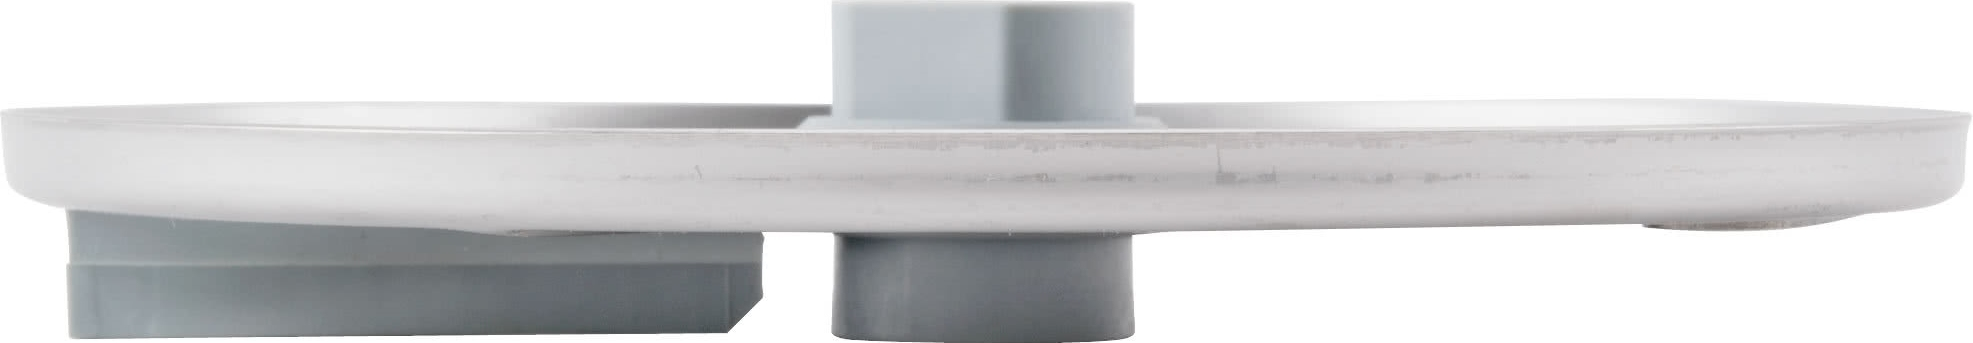 Диск-соломка Robot Coupe 27047 (4x4 мм) - 3